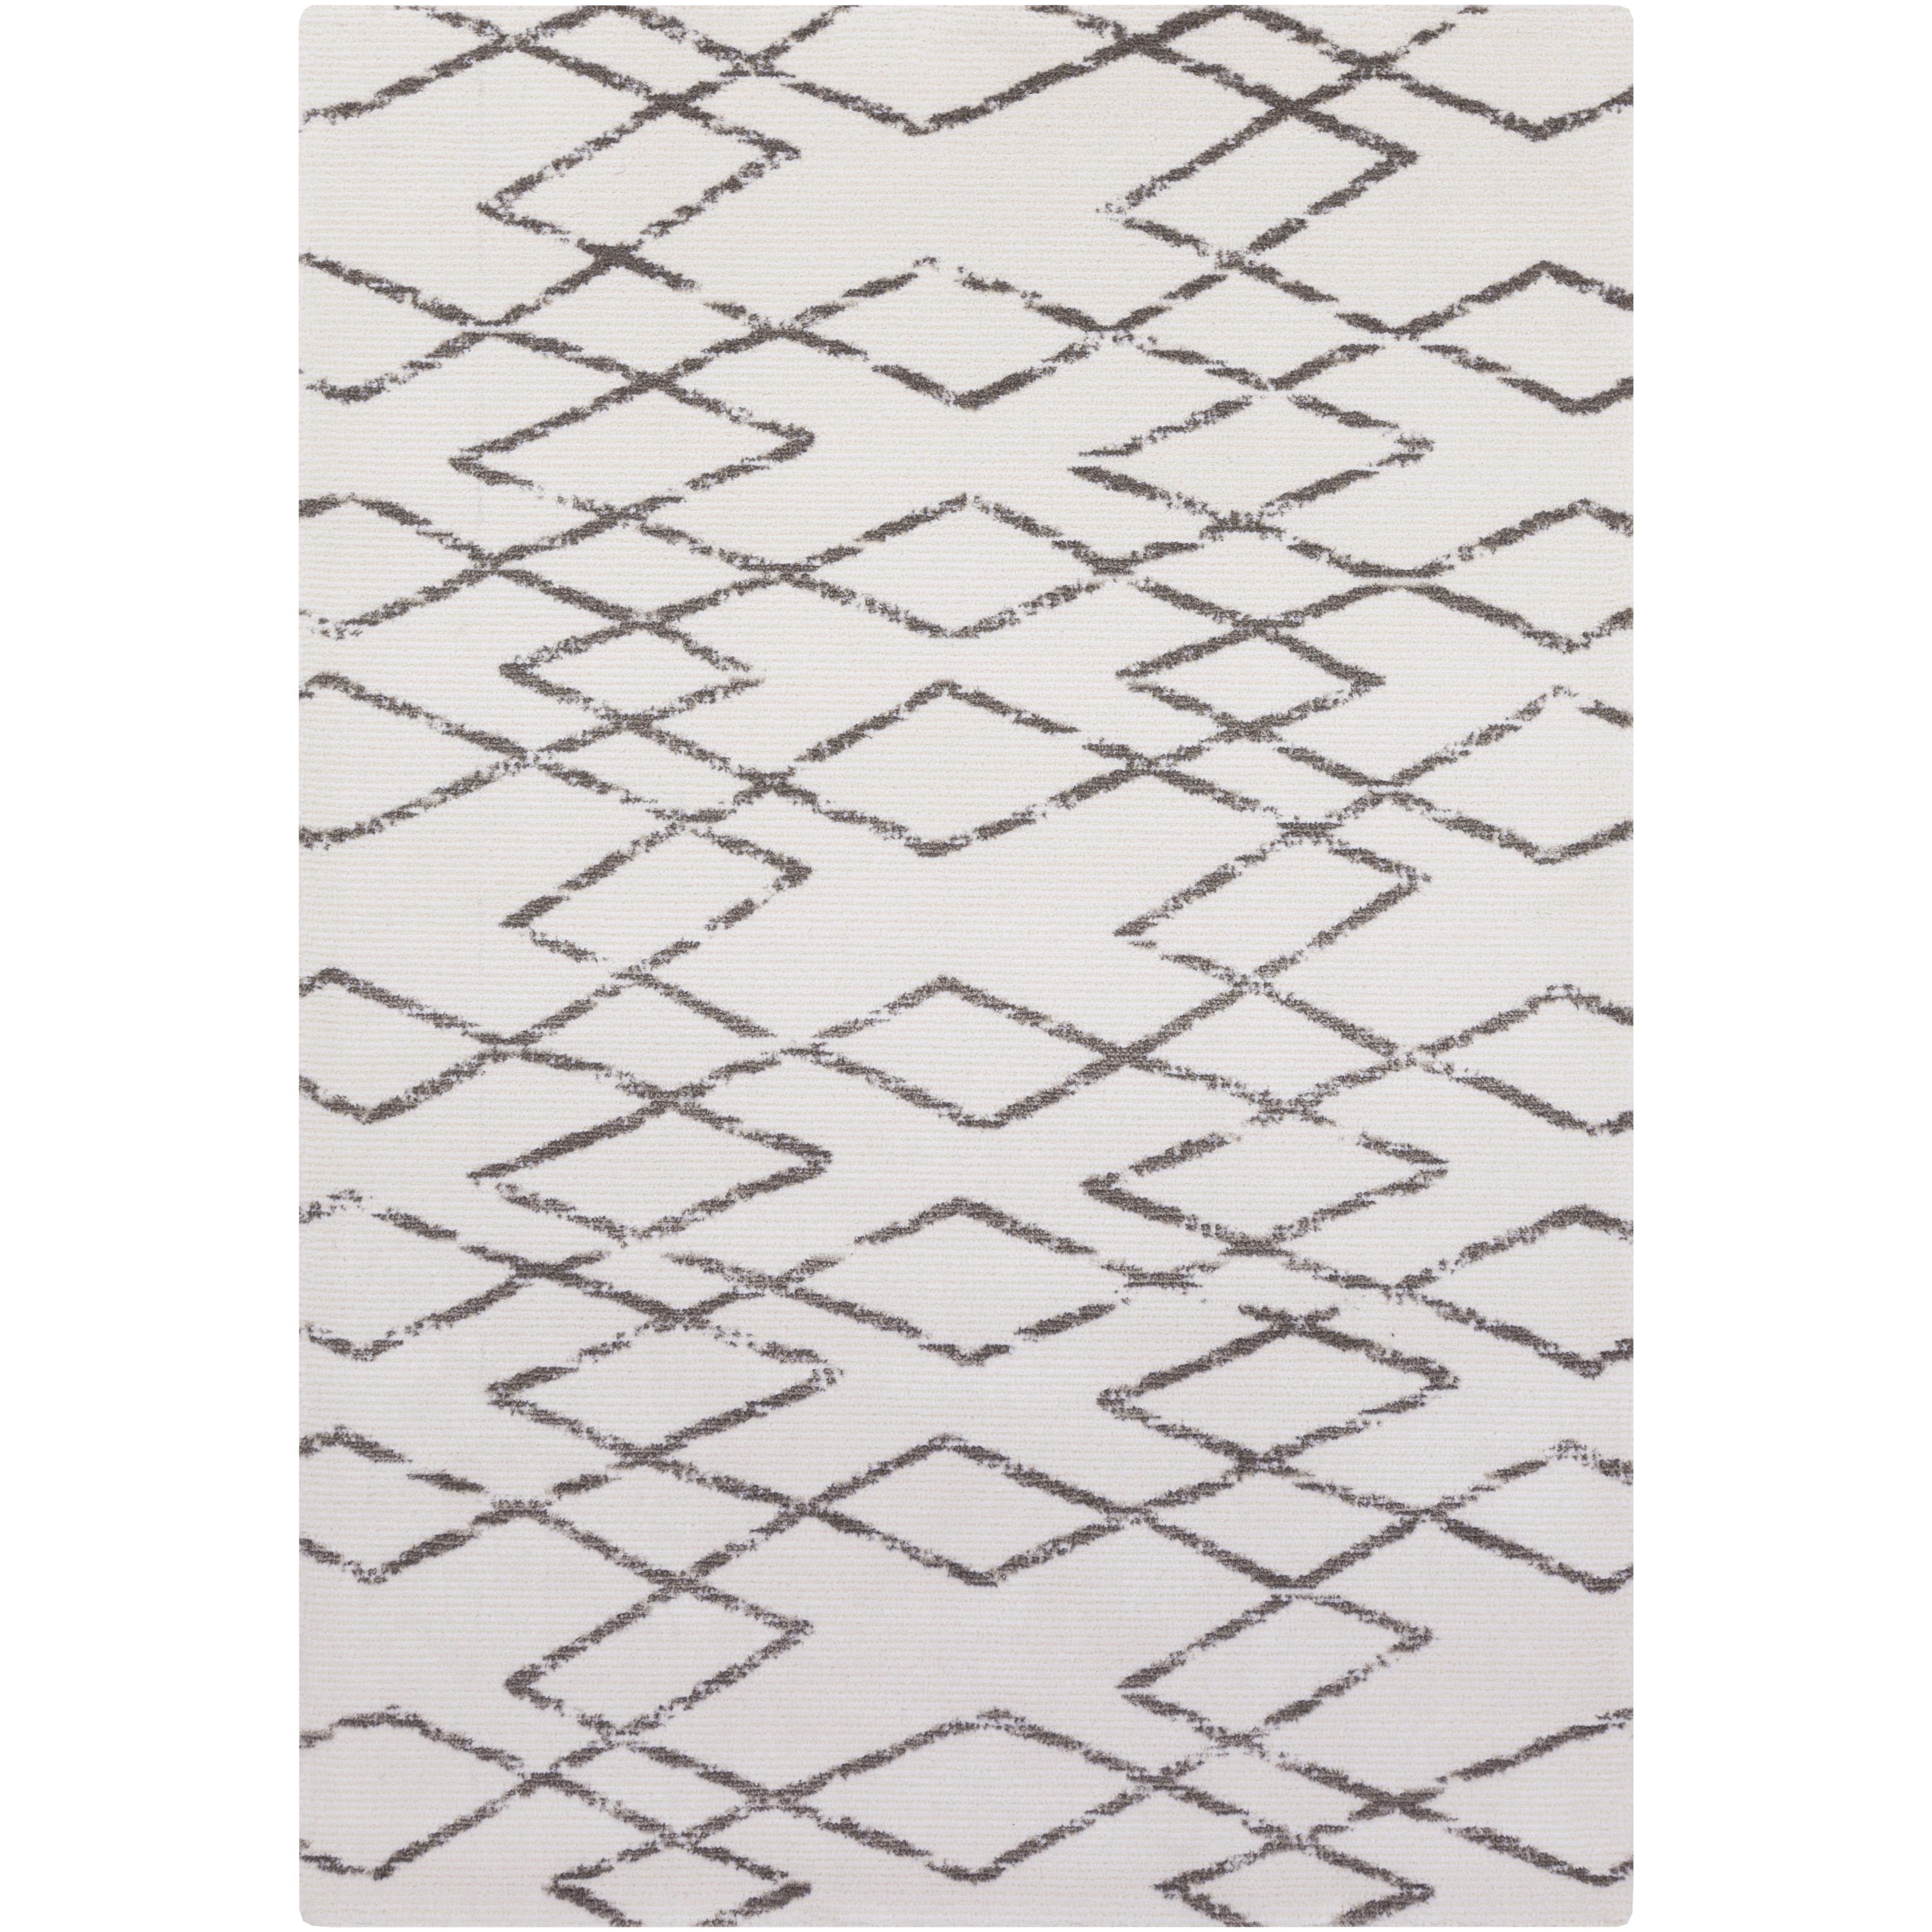 Surya Perla 9' x 12' - Item Number: PRA6001-912